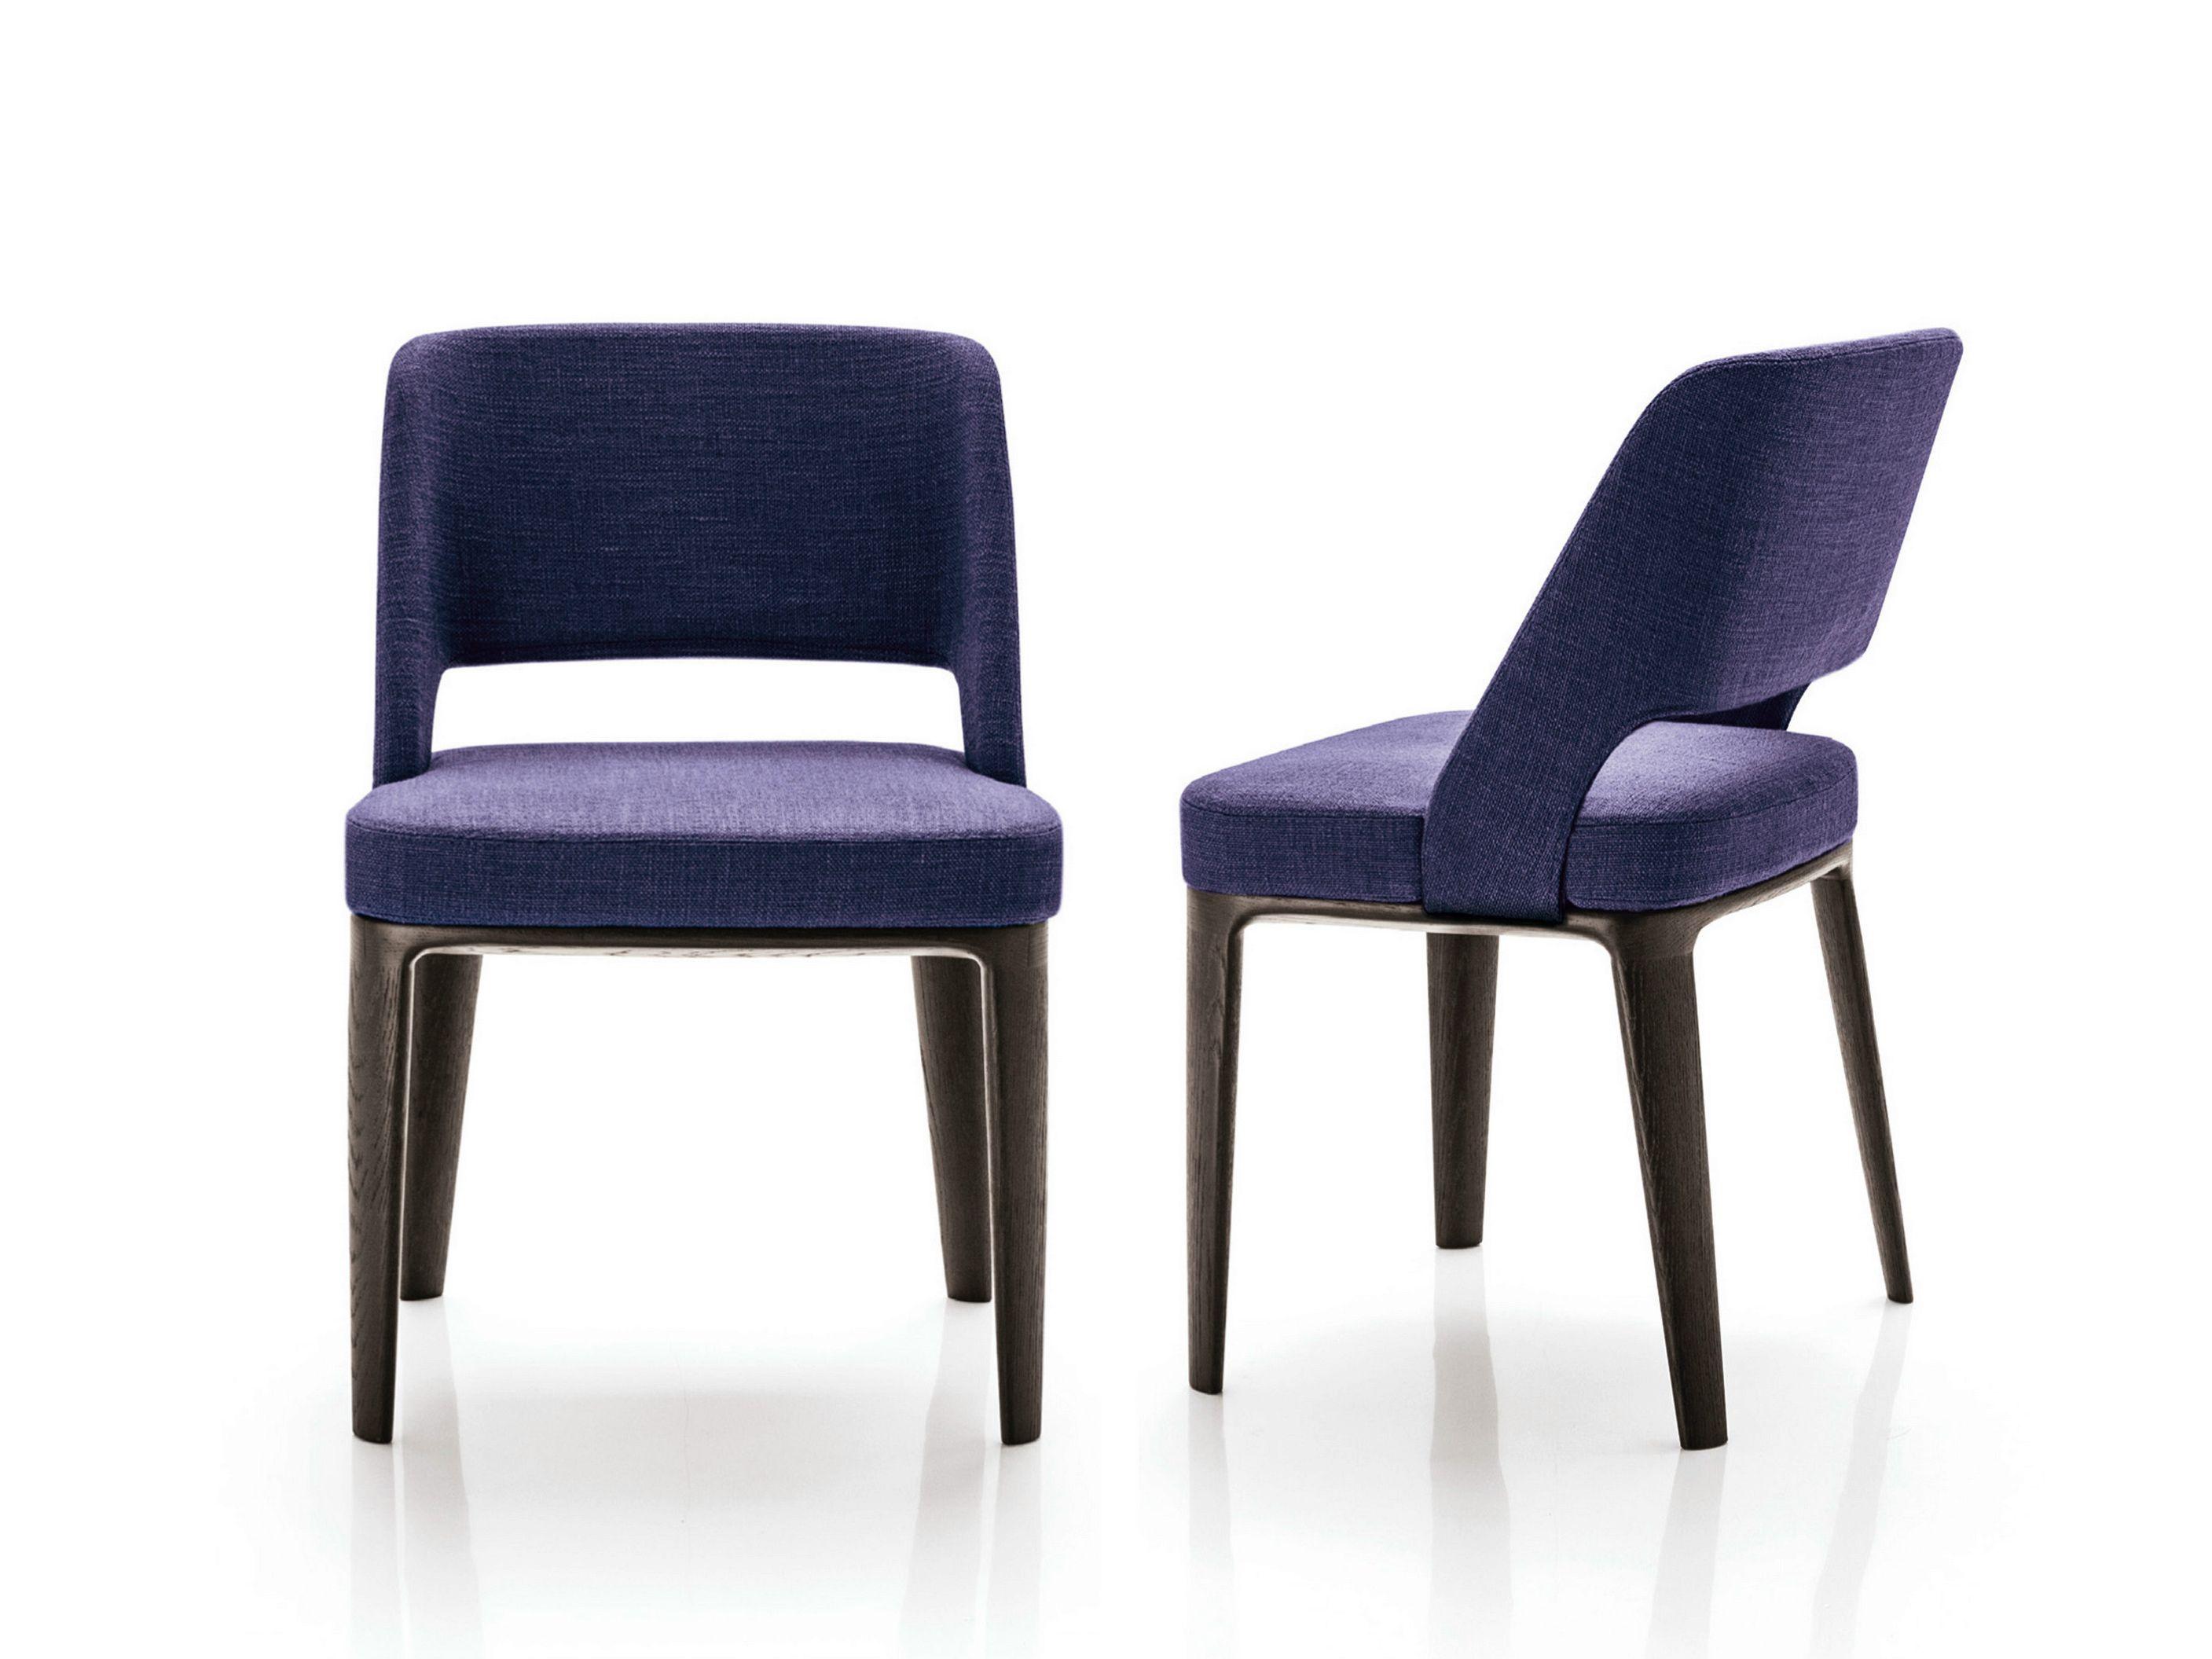 Sedie Frau ~ Risultati immagini per poltrona frau sedie seats pinterest